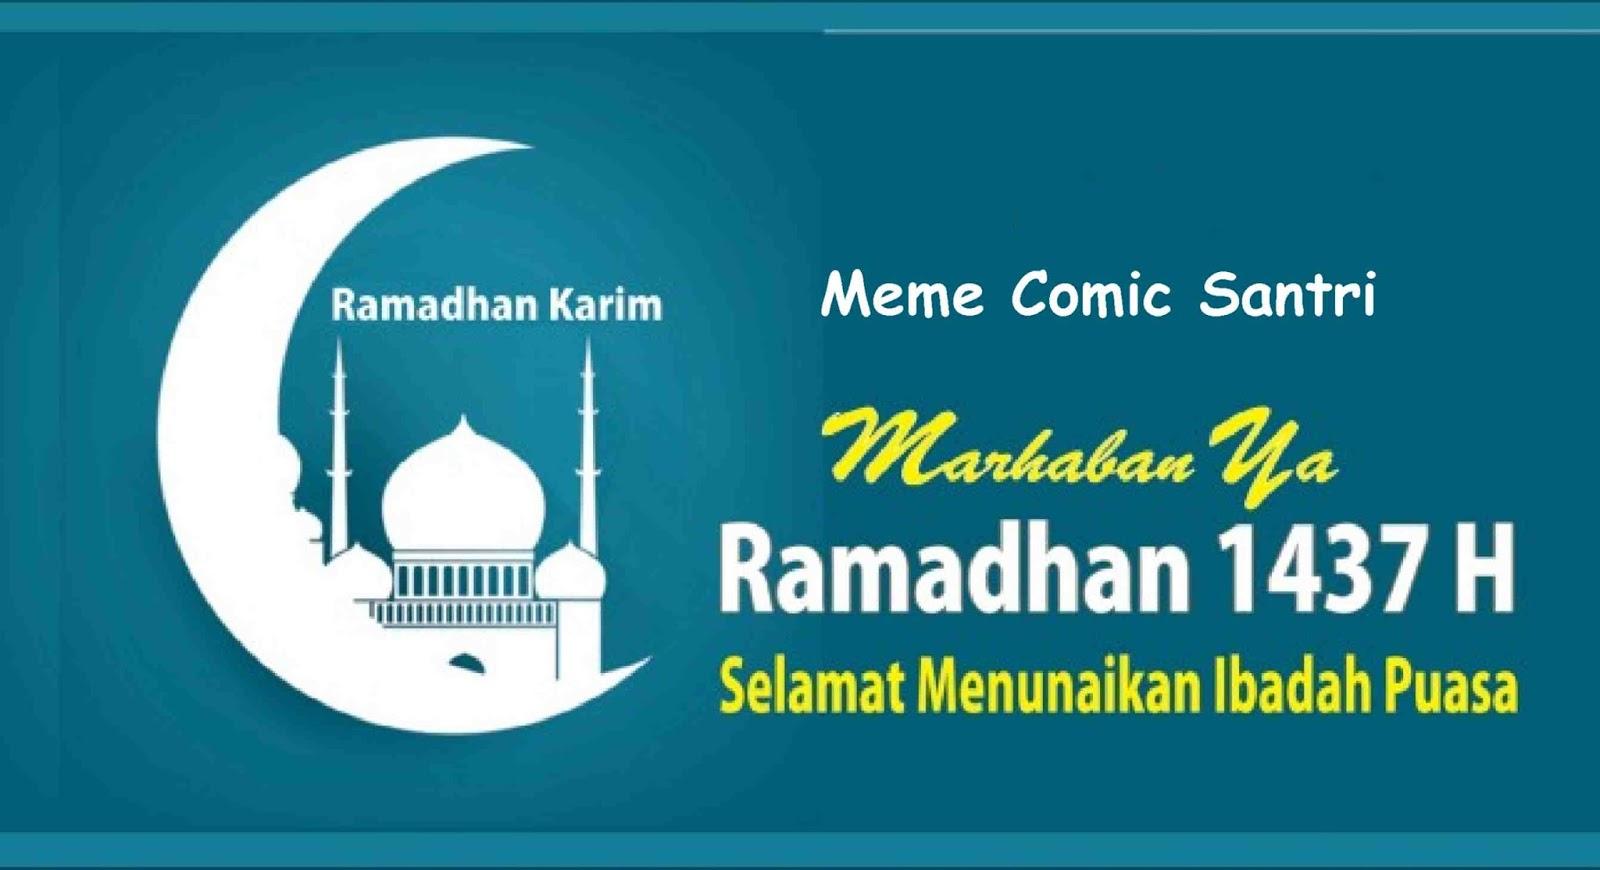 Meme lucu sambut ramadhan stok gambar lucu